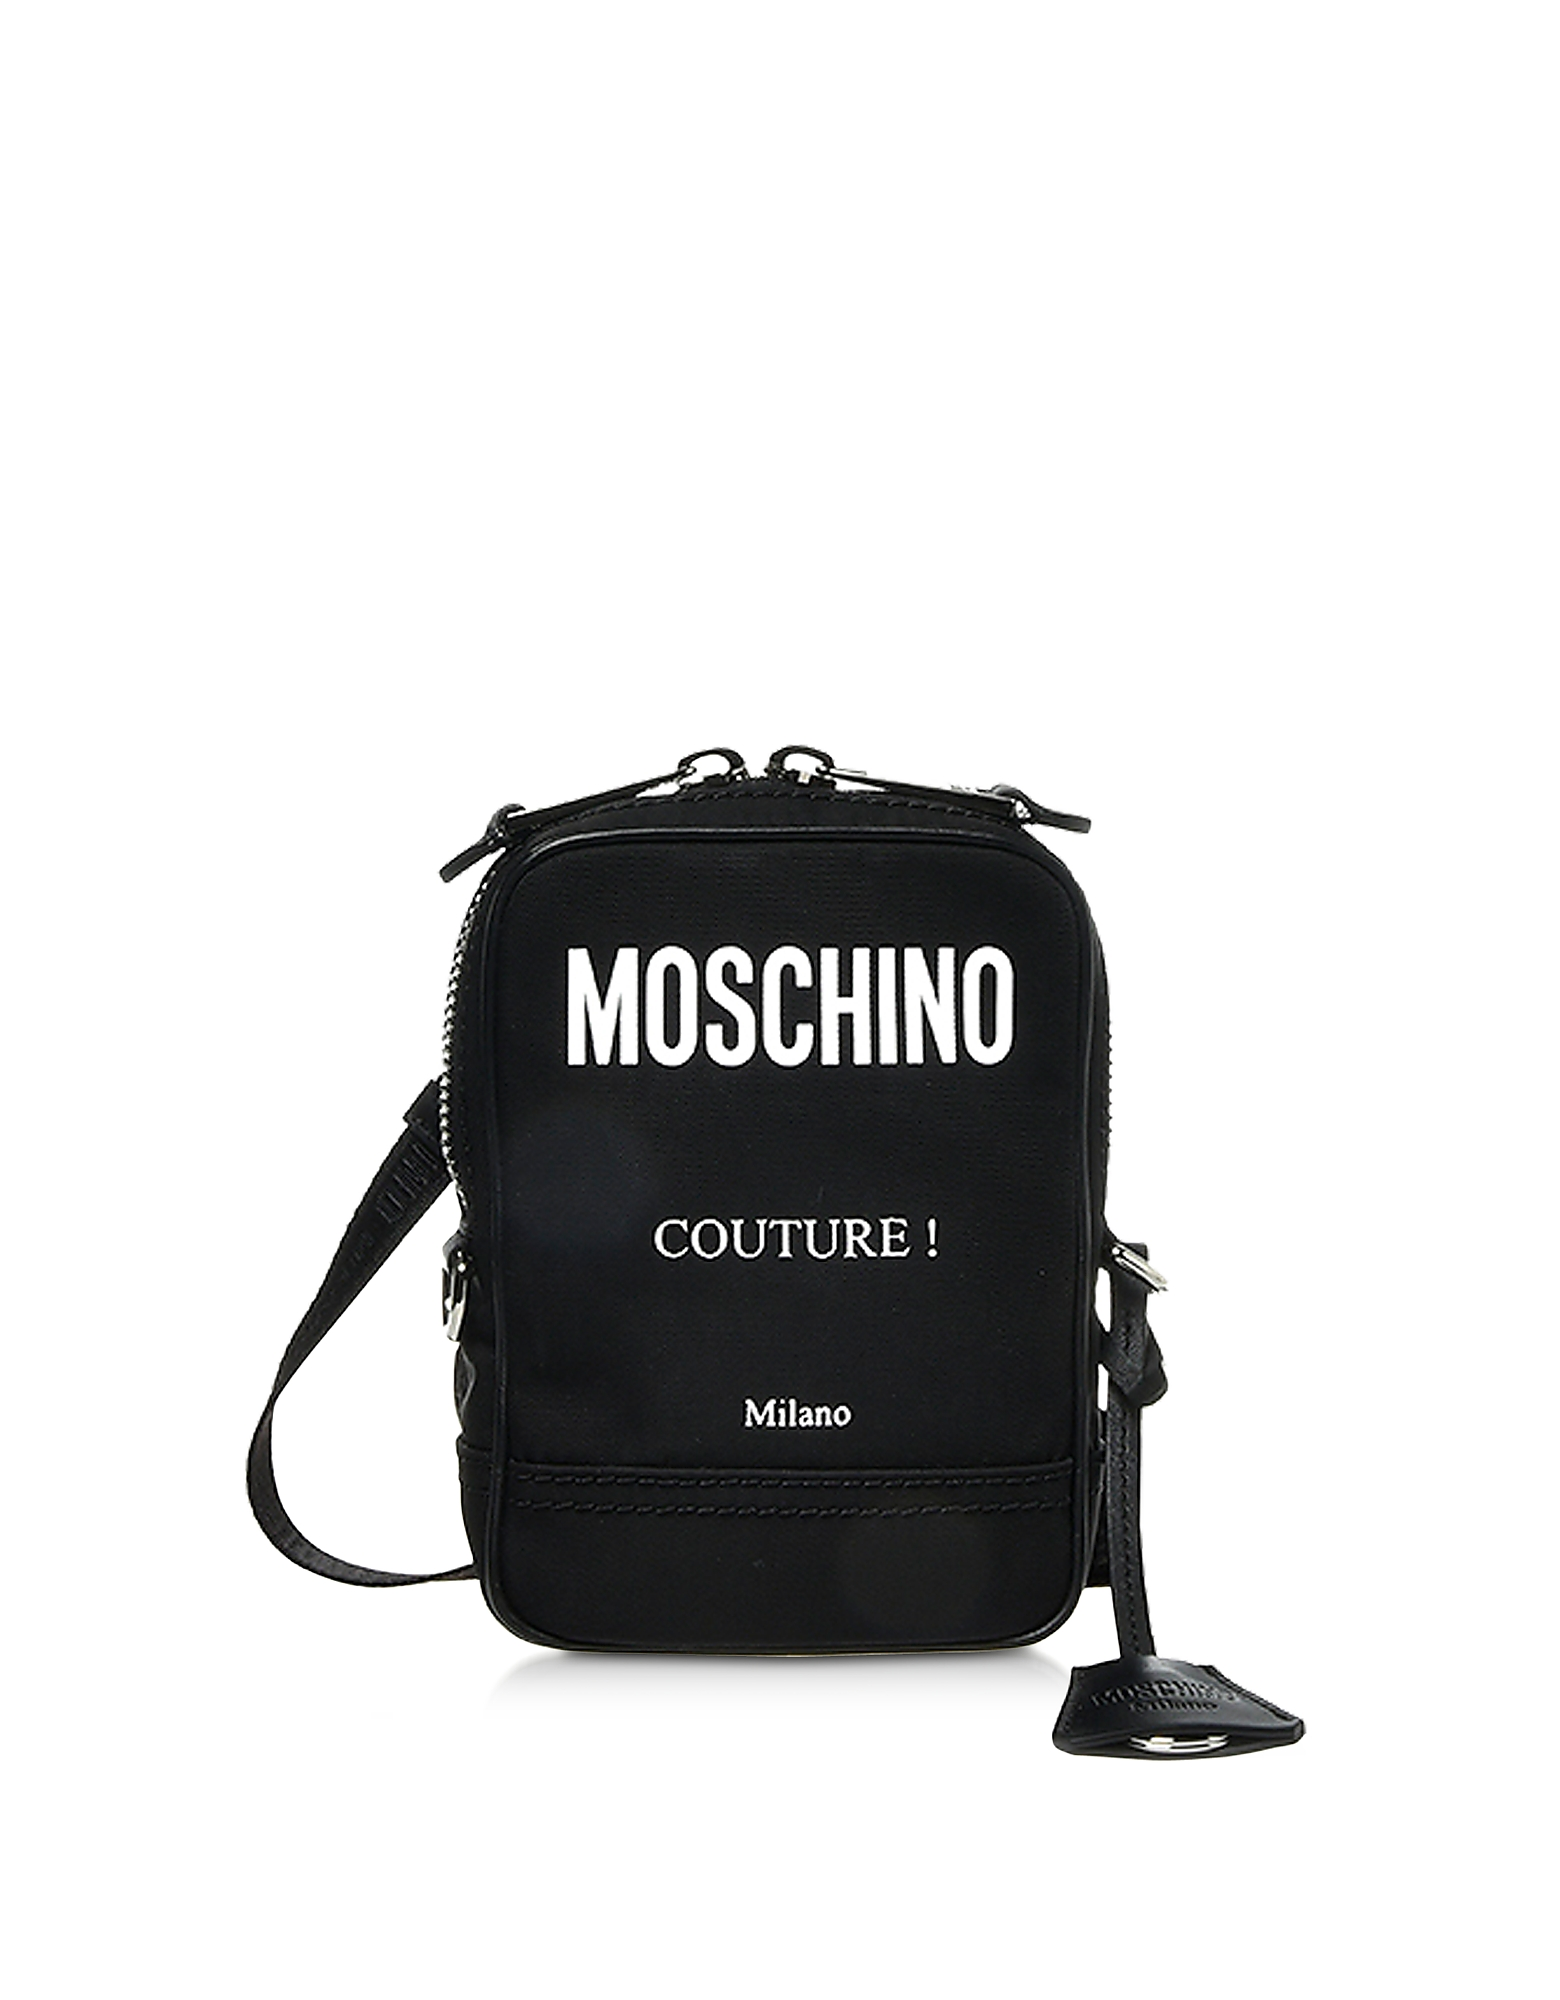 Black Nylon Couture Crossbody Bag